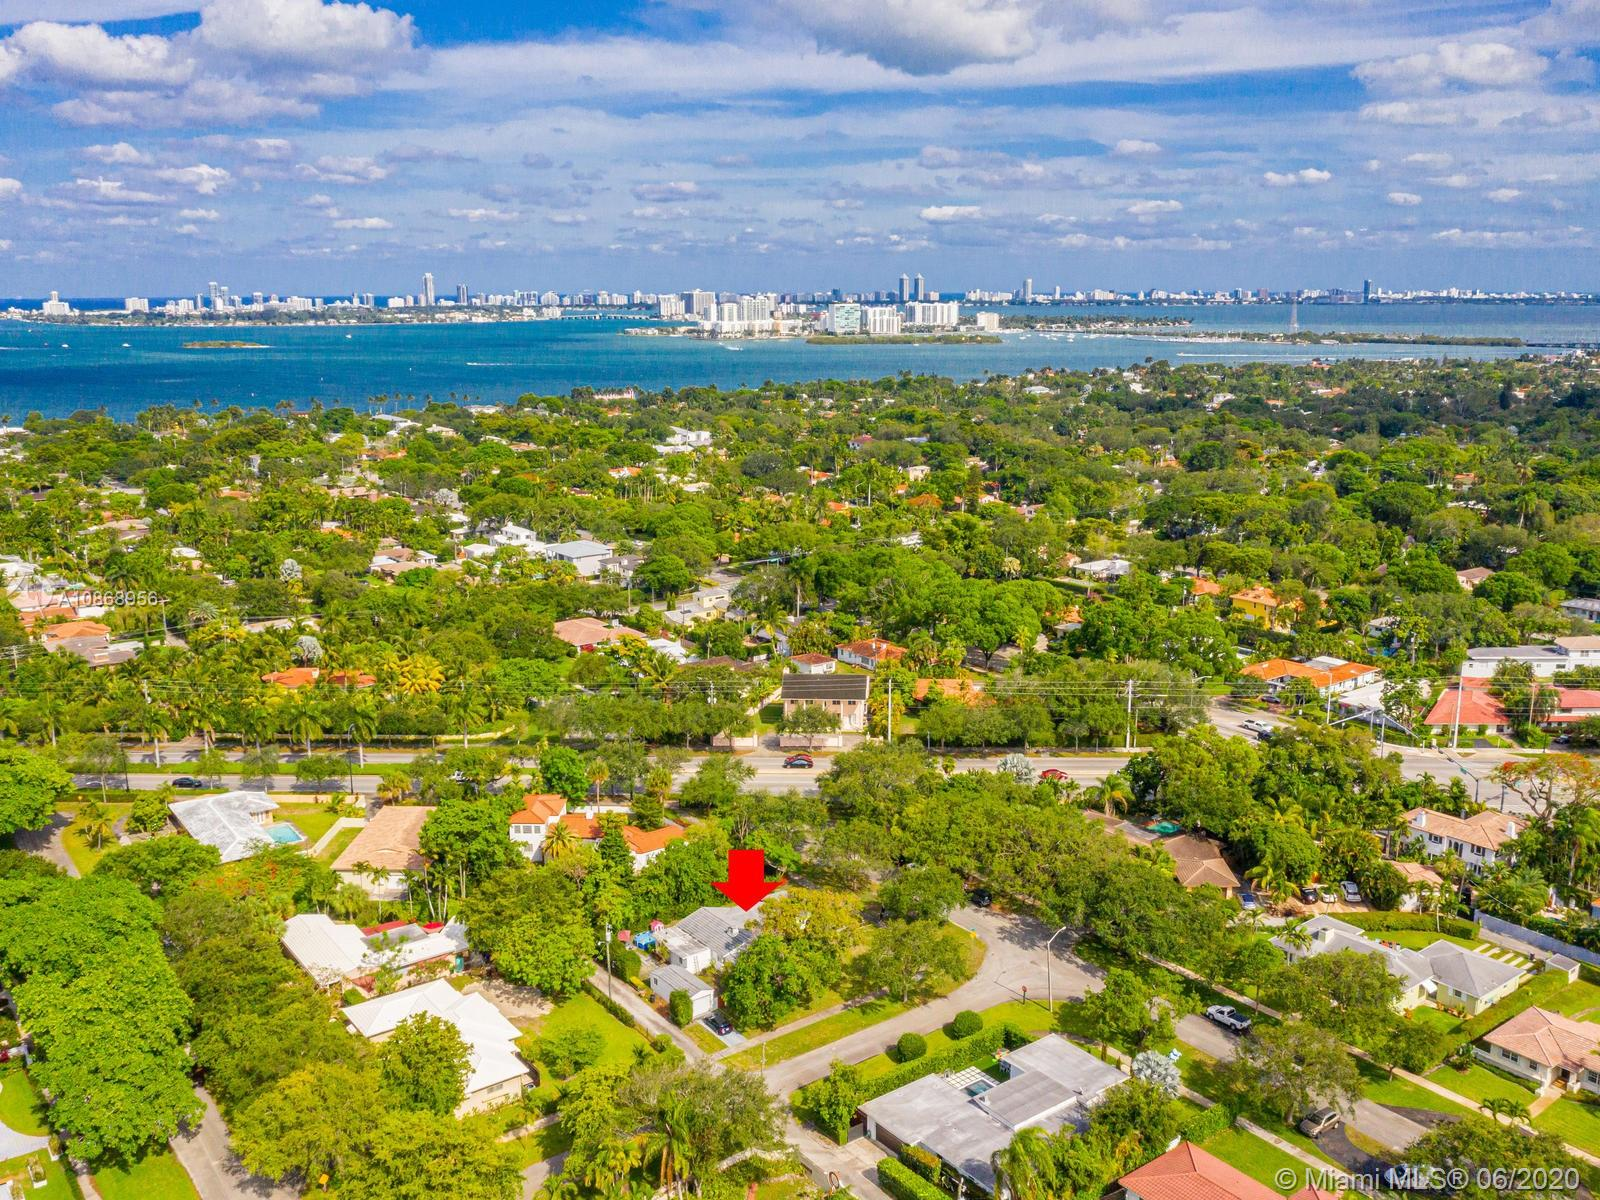 Miami Shores # - 51 - photo